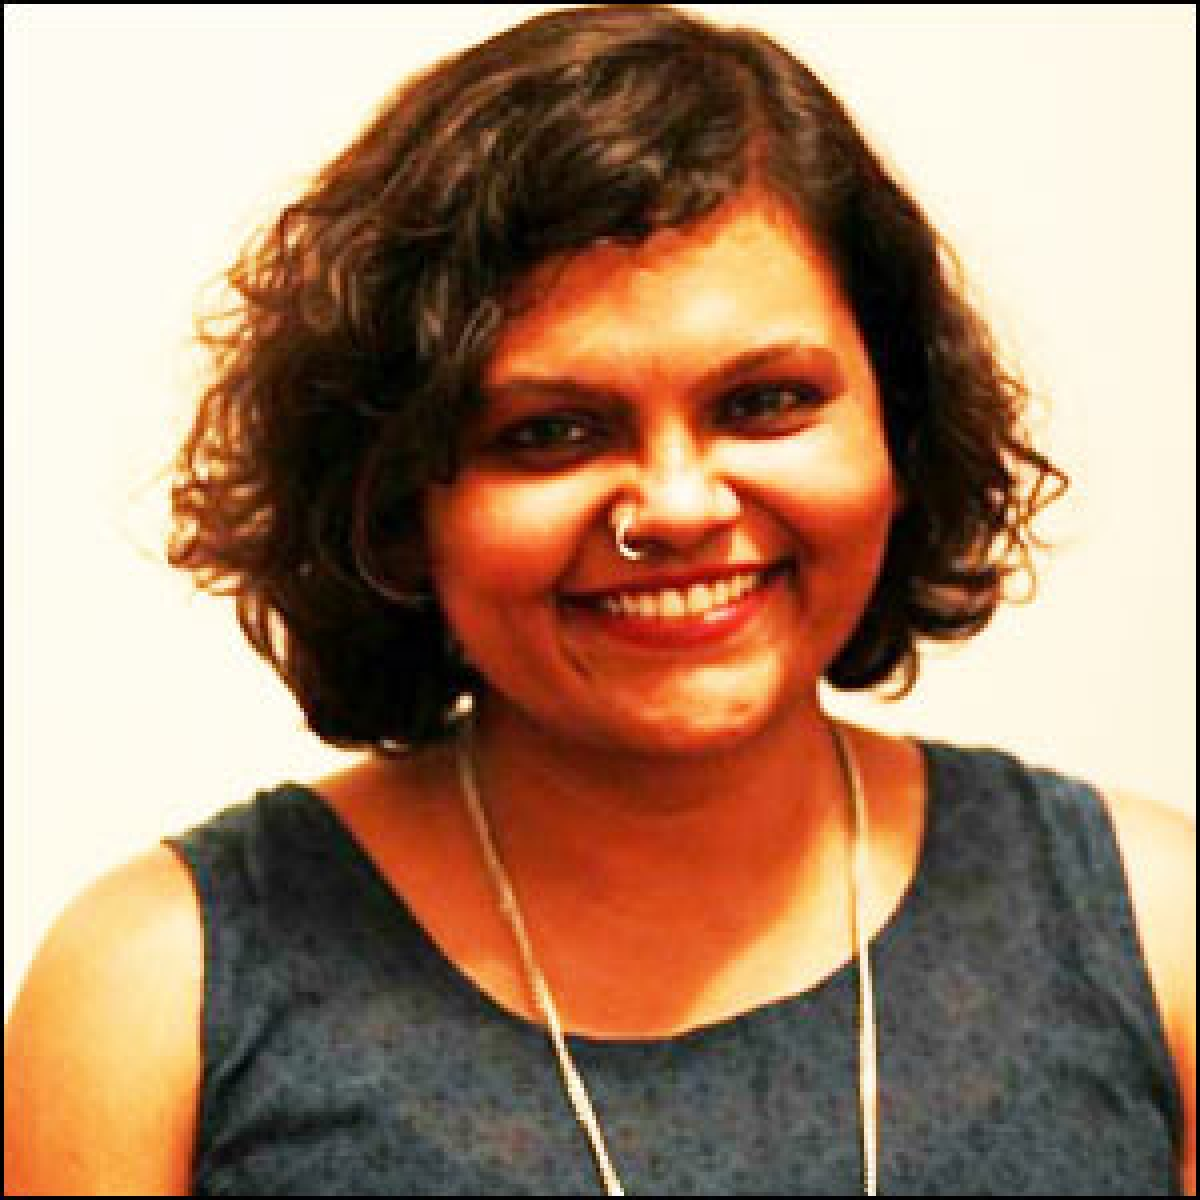 """Instead of asking 'Kitna Deti Hai?'..."" says Tata Nexon"